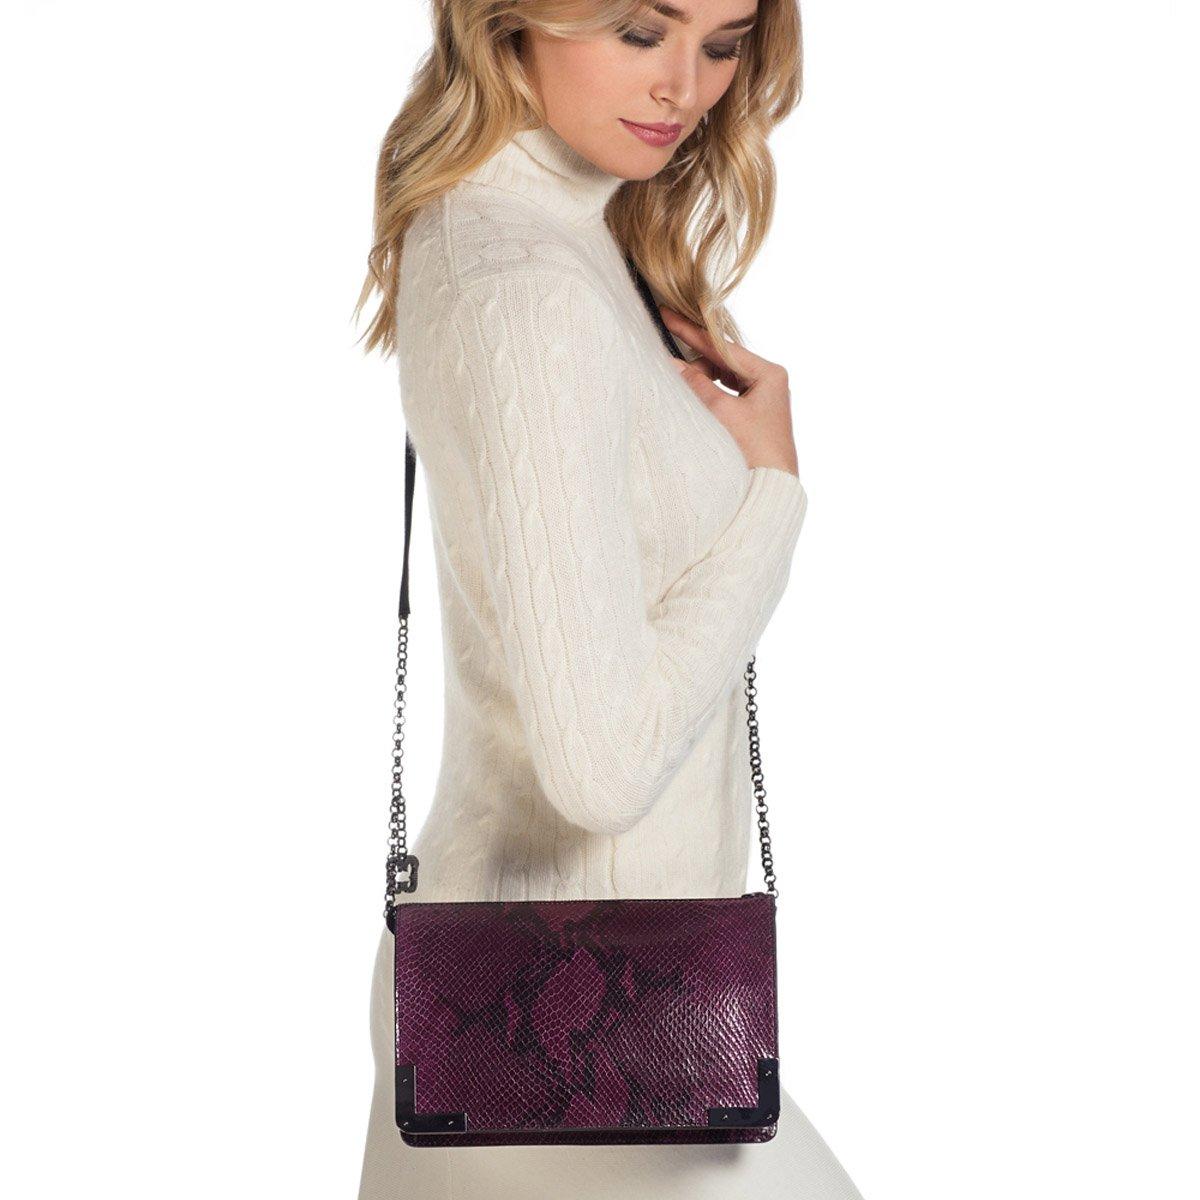 Eric Javits Luxury Fashion Designer Women's Handbag - Perkins II - Plum